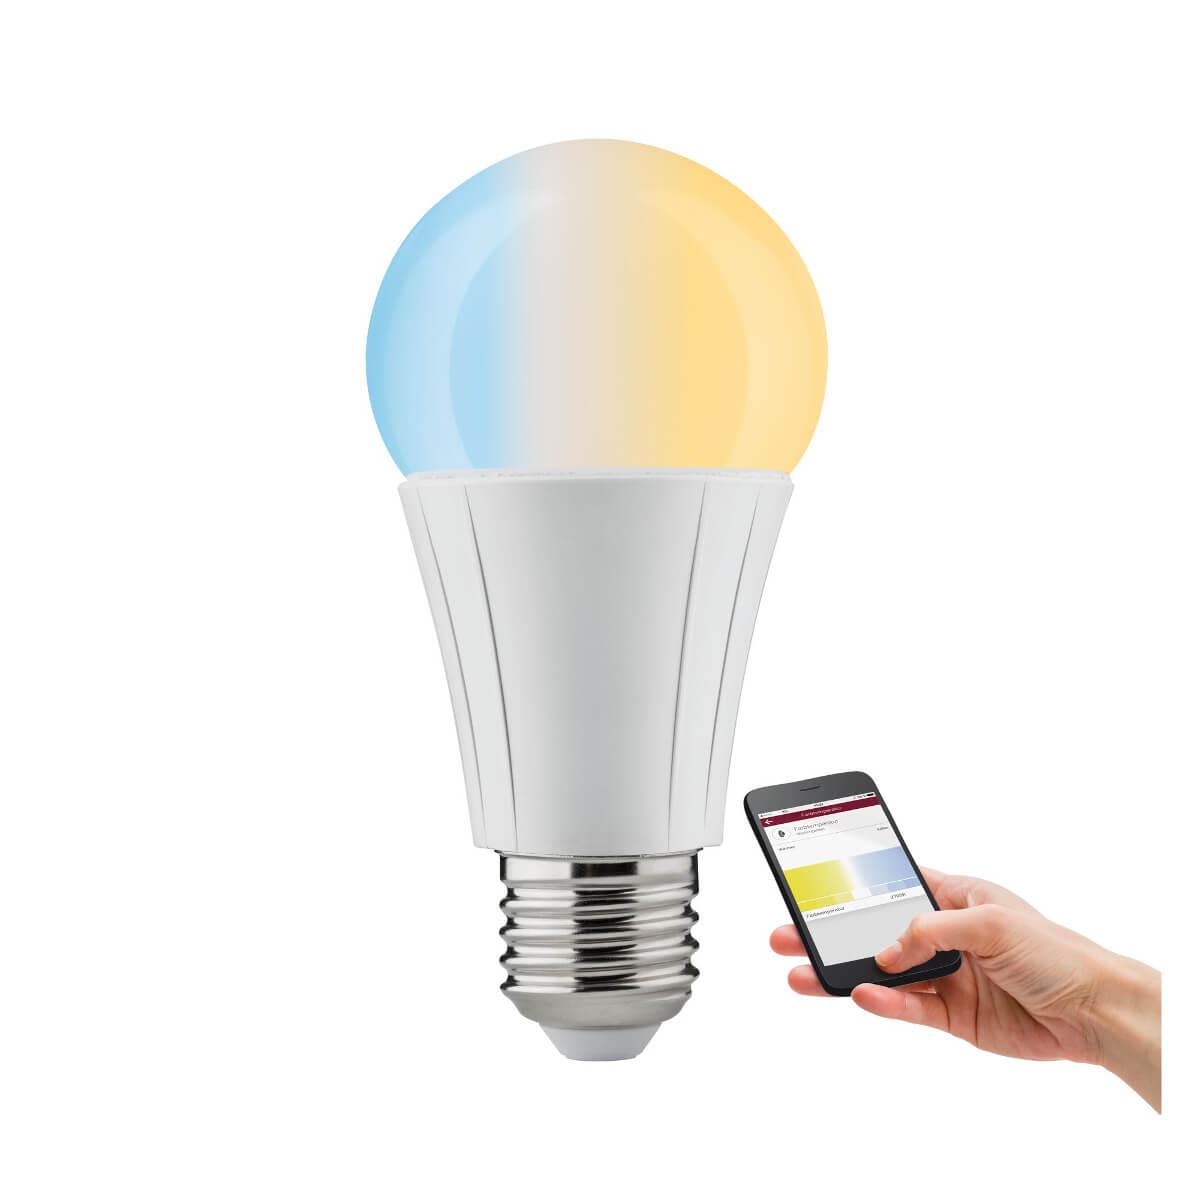 Paulmann SmartHome ZigBee LED AGL Soret 8,5 W E27 Tunable White, App-Steuerung